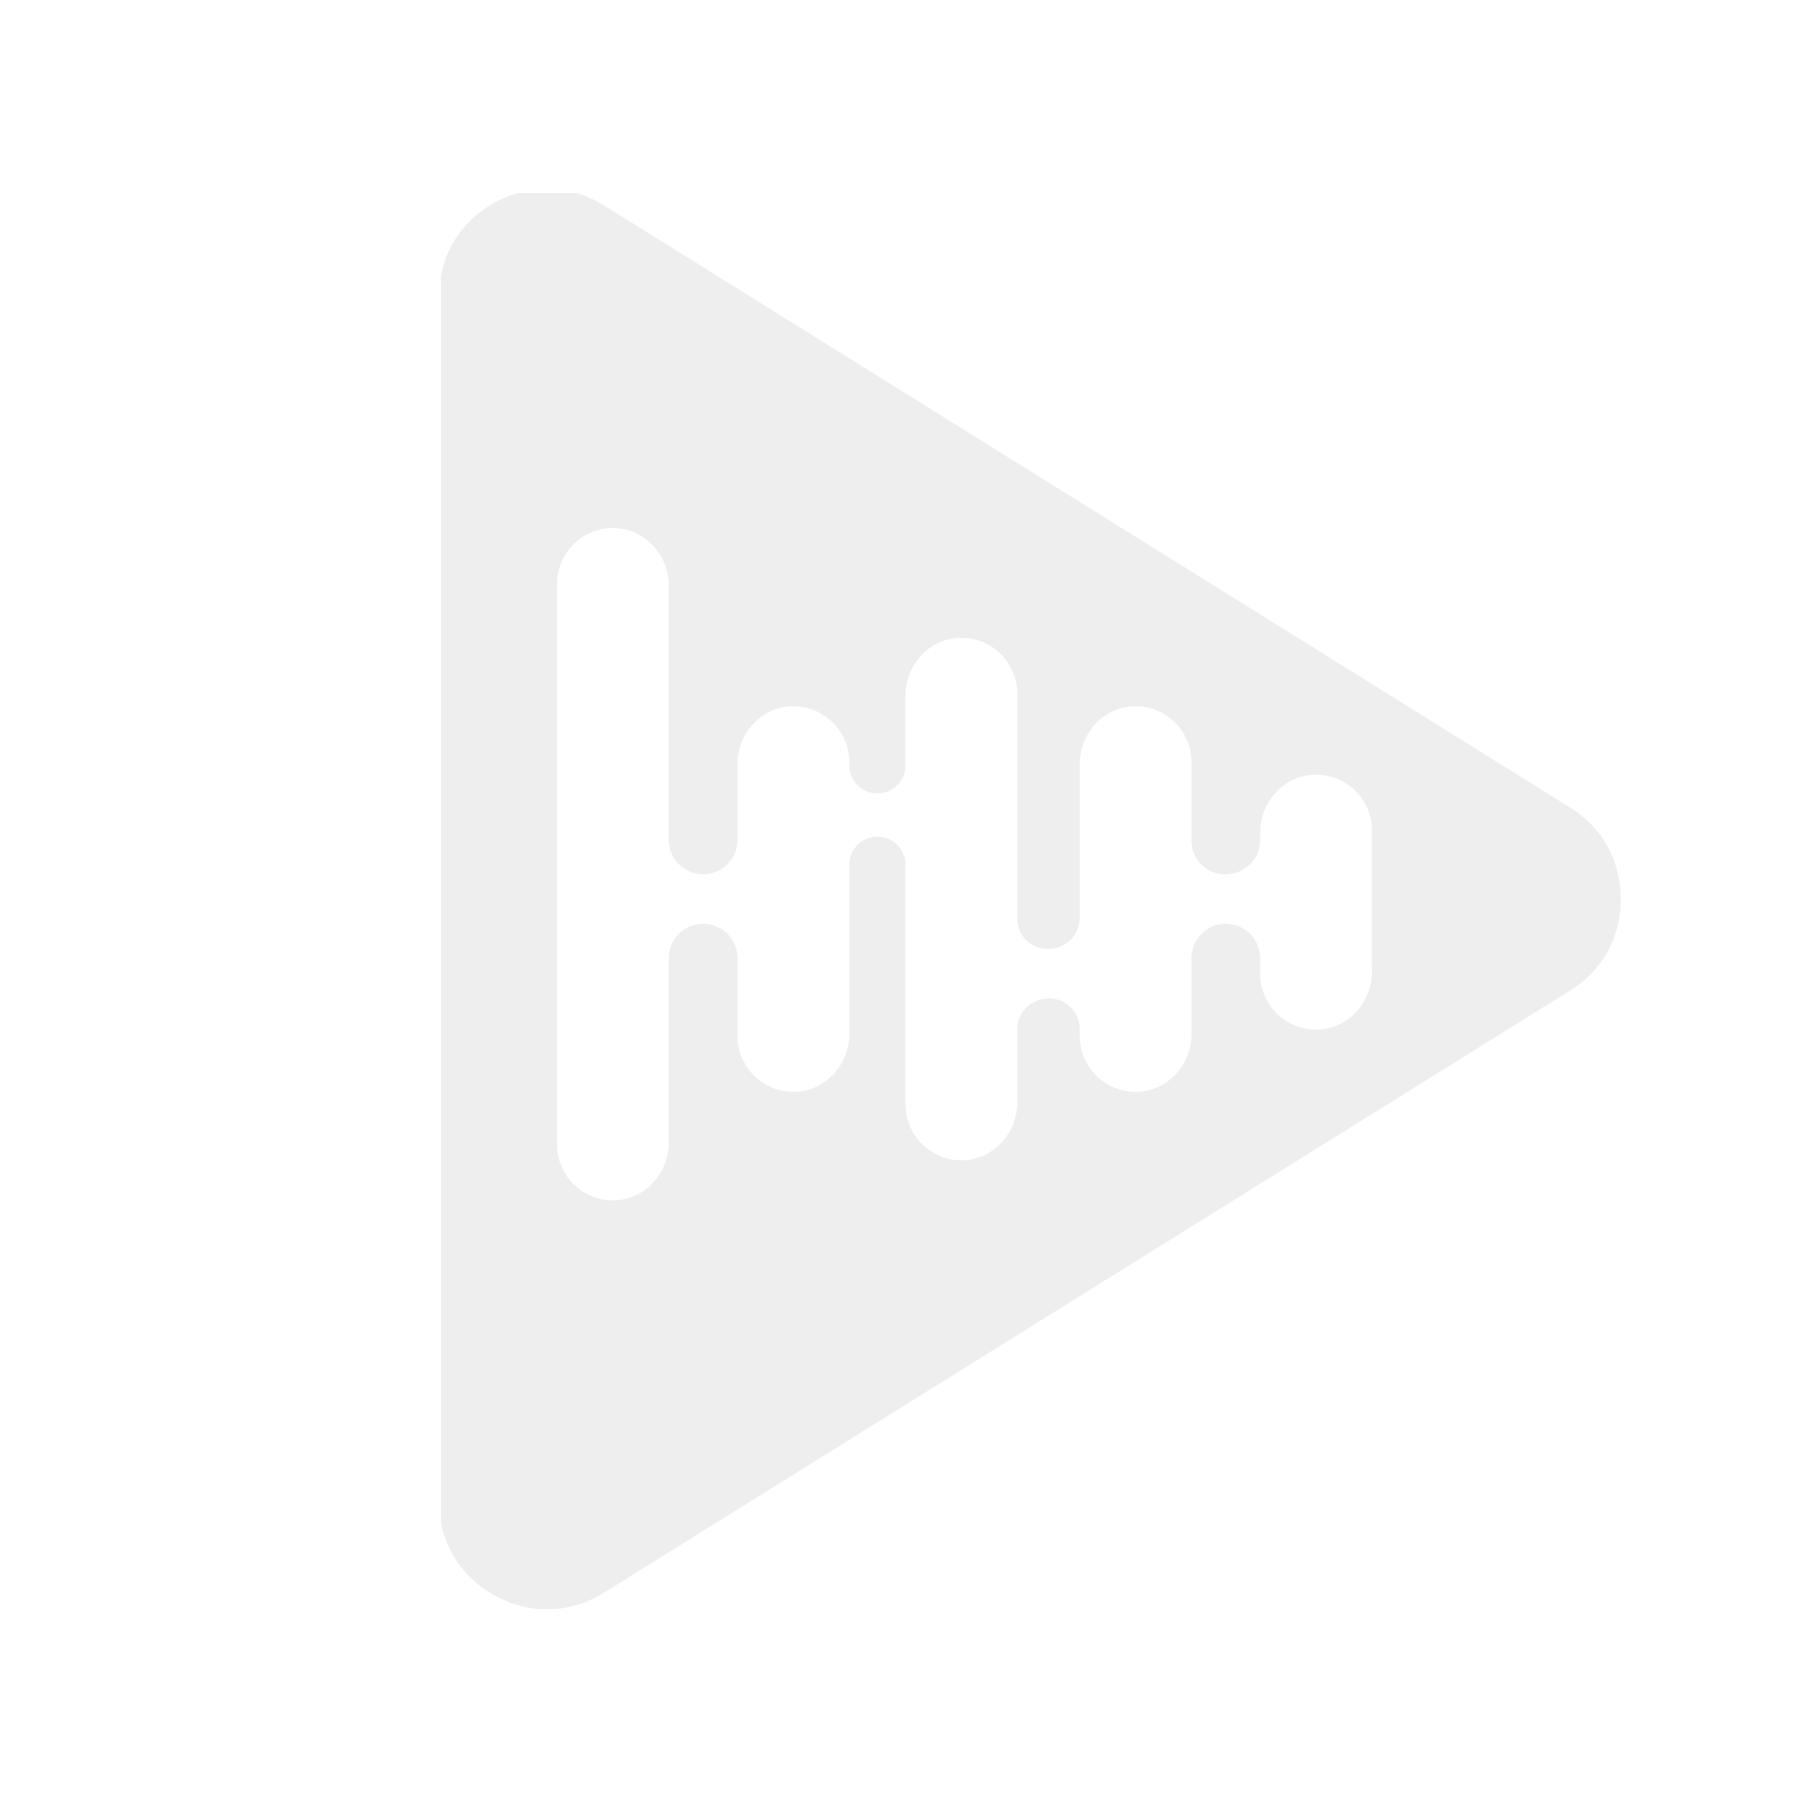 Grandview 148640 - Lerret Cyber, 16:9, 266x150, Manuelt 120